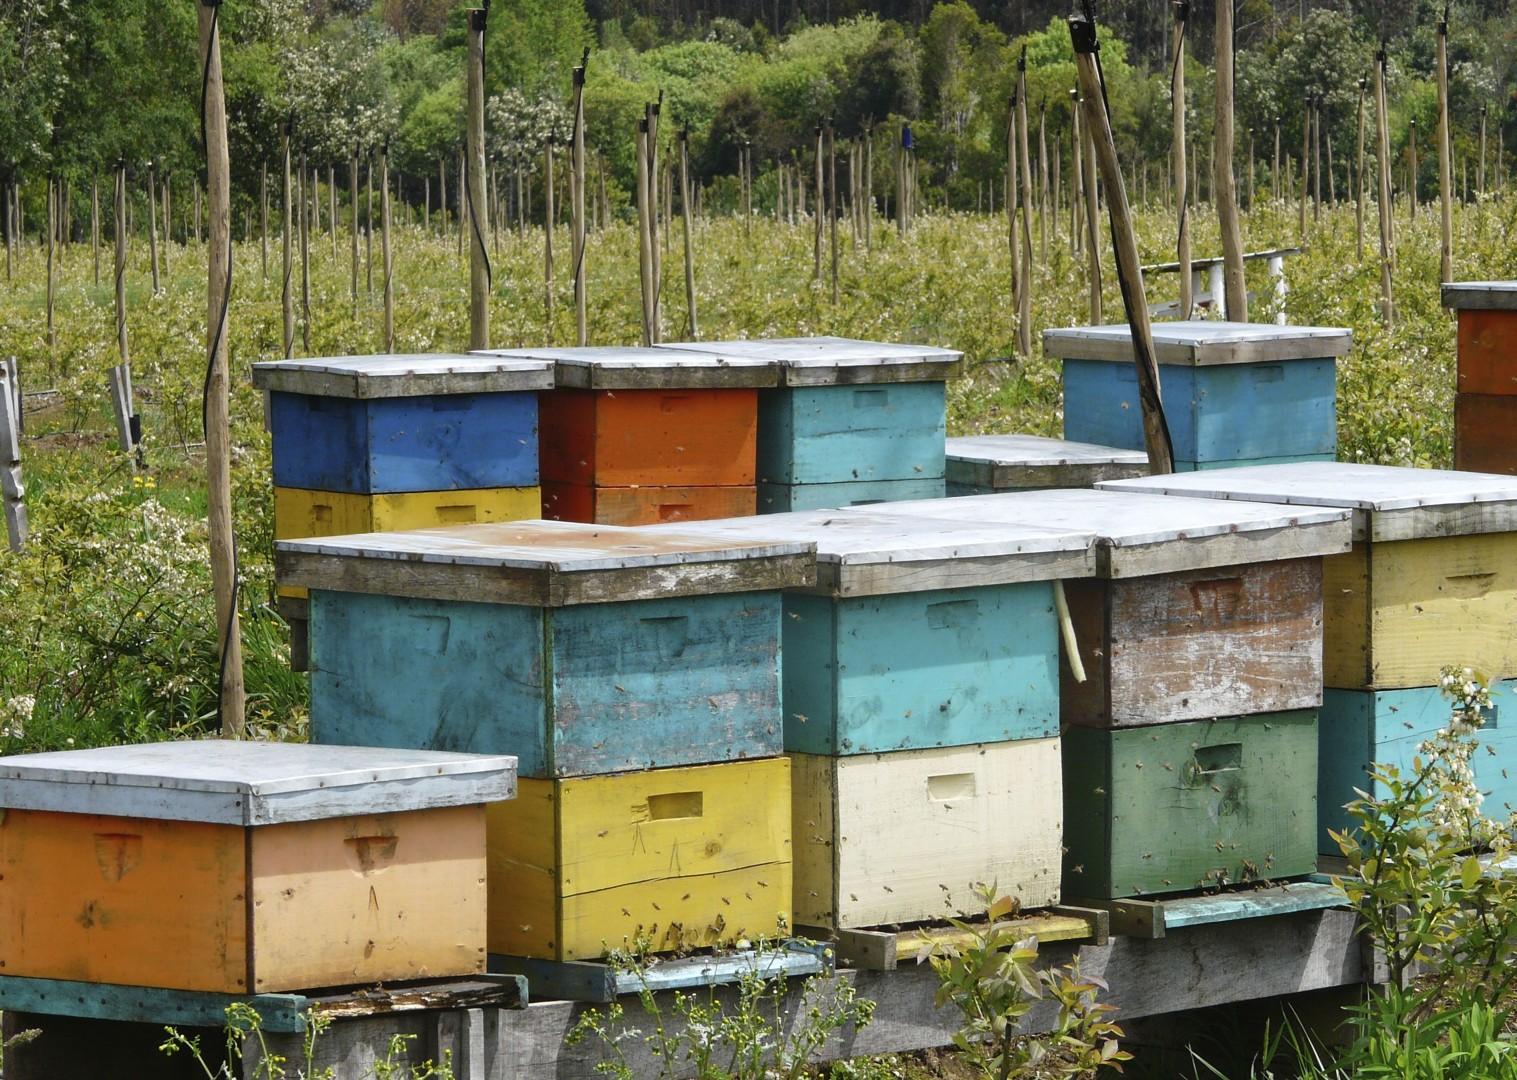 Beehives at Apicoop.jpg - Chile - Meet the People Tours